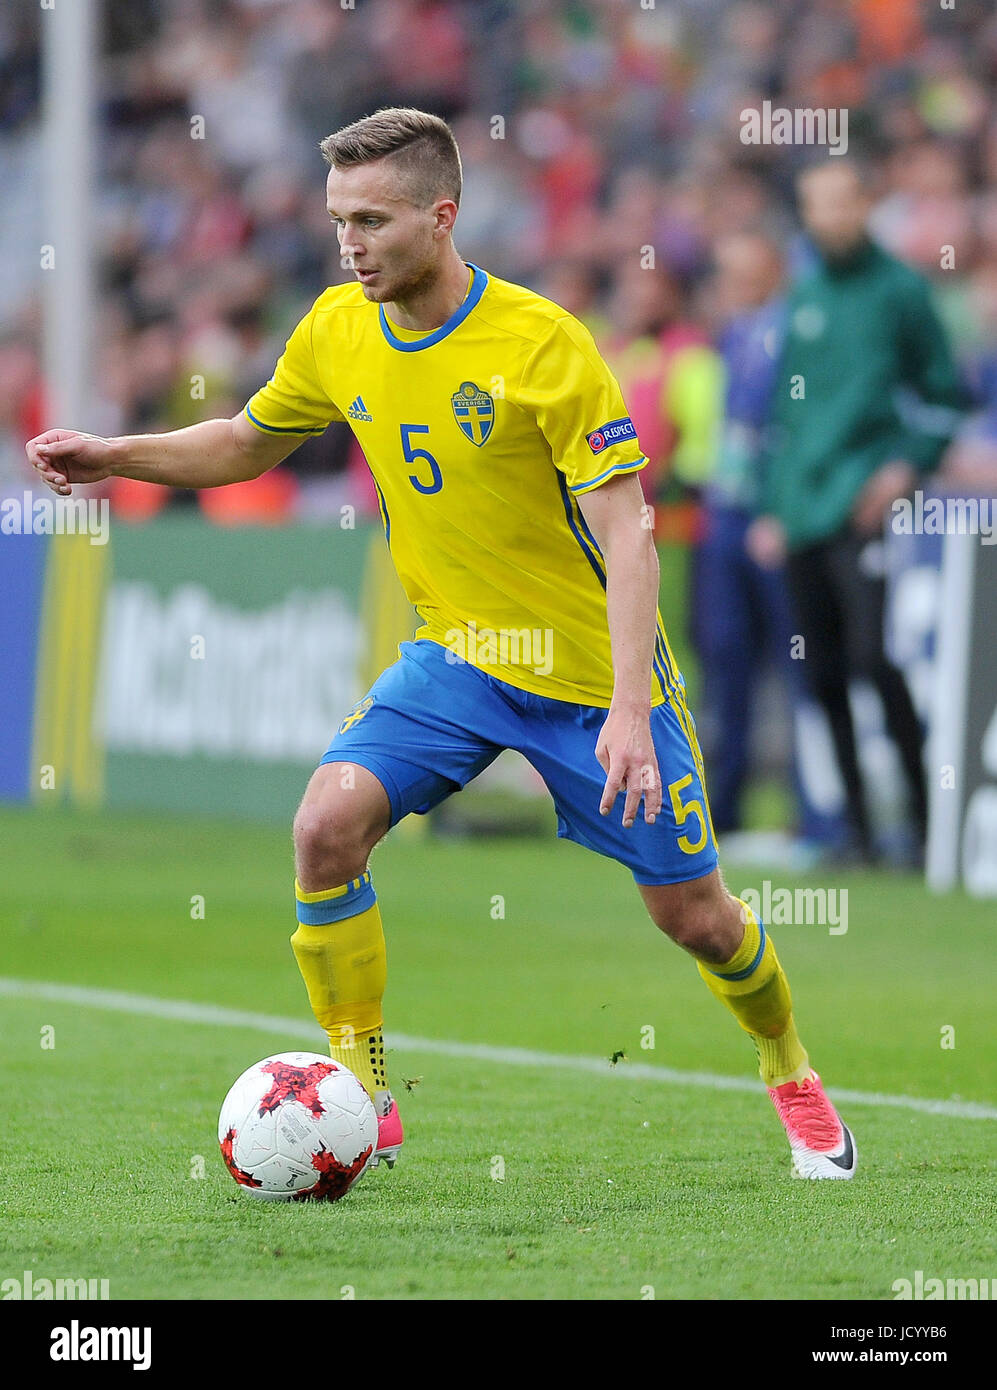 Adam Lundqvist during the UEFA European Under-21 match between Sweden and England at Kolporter Arena on June 16, - Stock Image